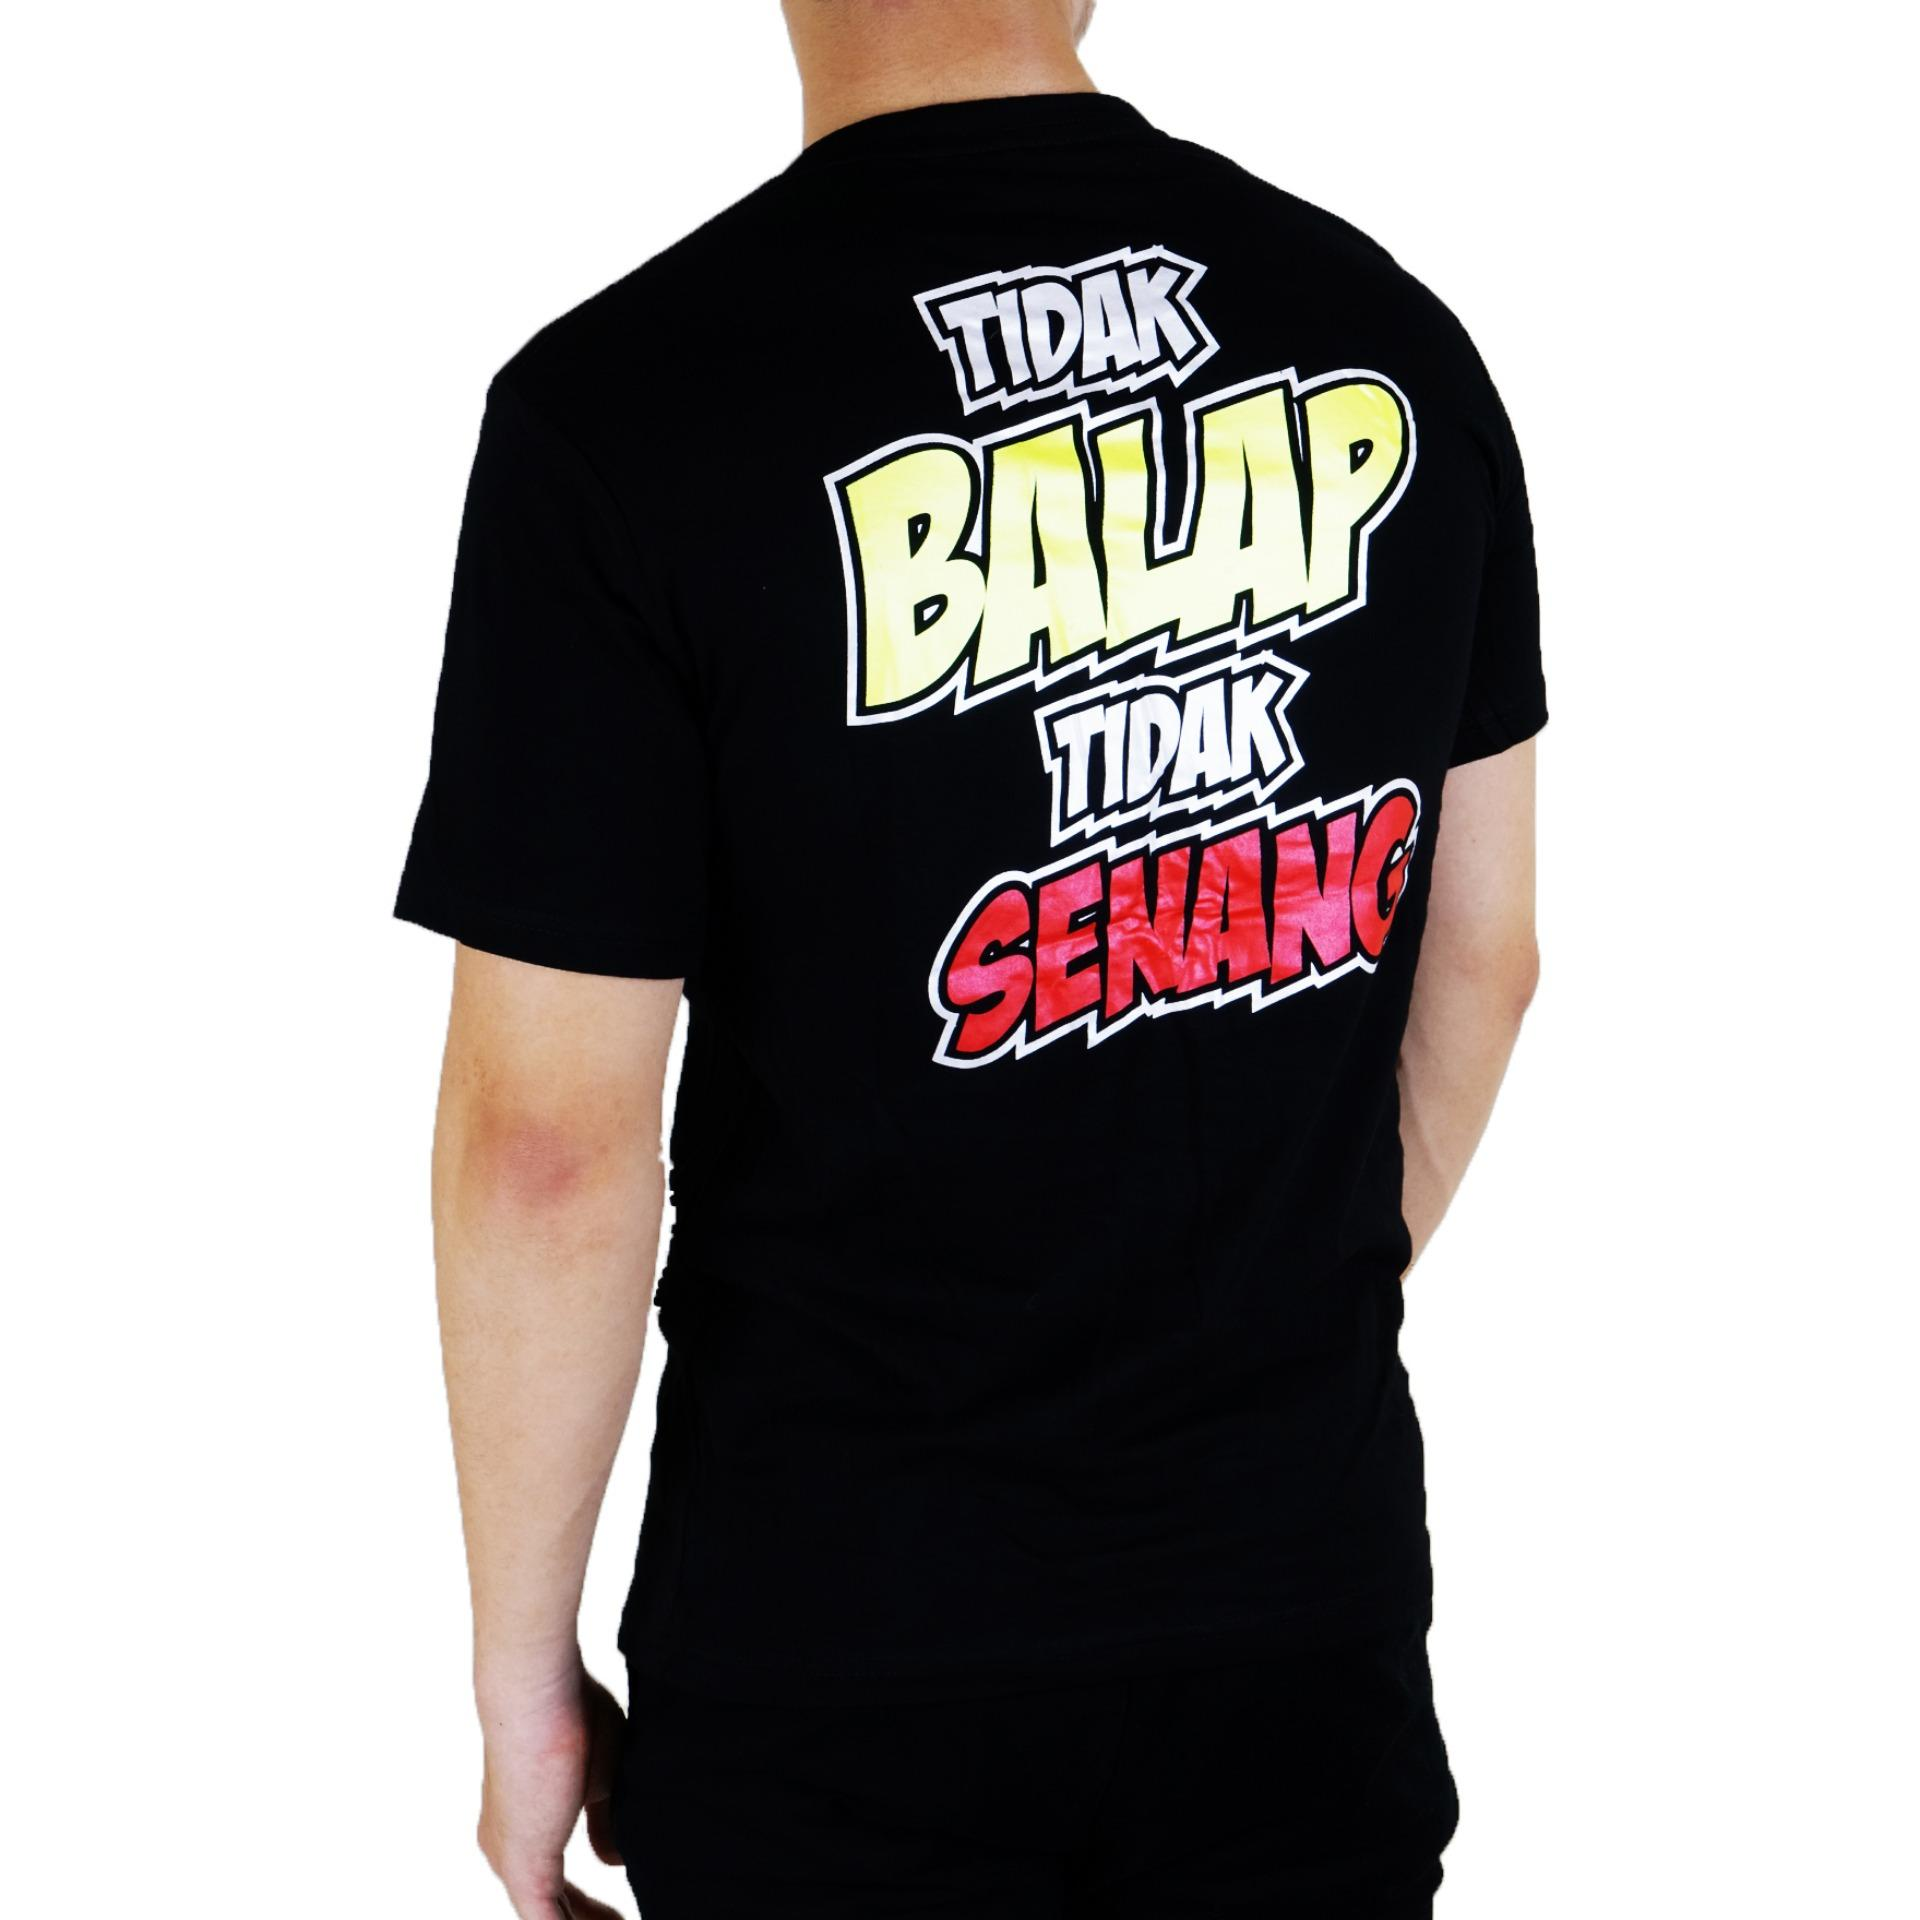 Detail Gambar Vanwin - Kaos T-Shirt Distro / kaos Pria / Tshirt Pria / Distro Pria / Baju Pria Premium Racing Gaspoll - Hitam Terkini